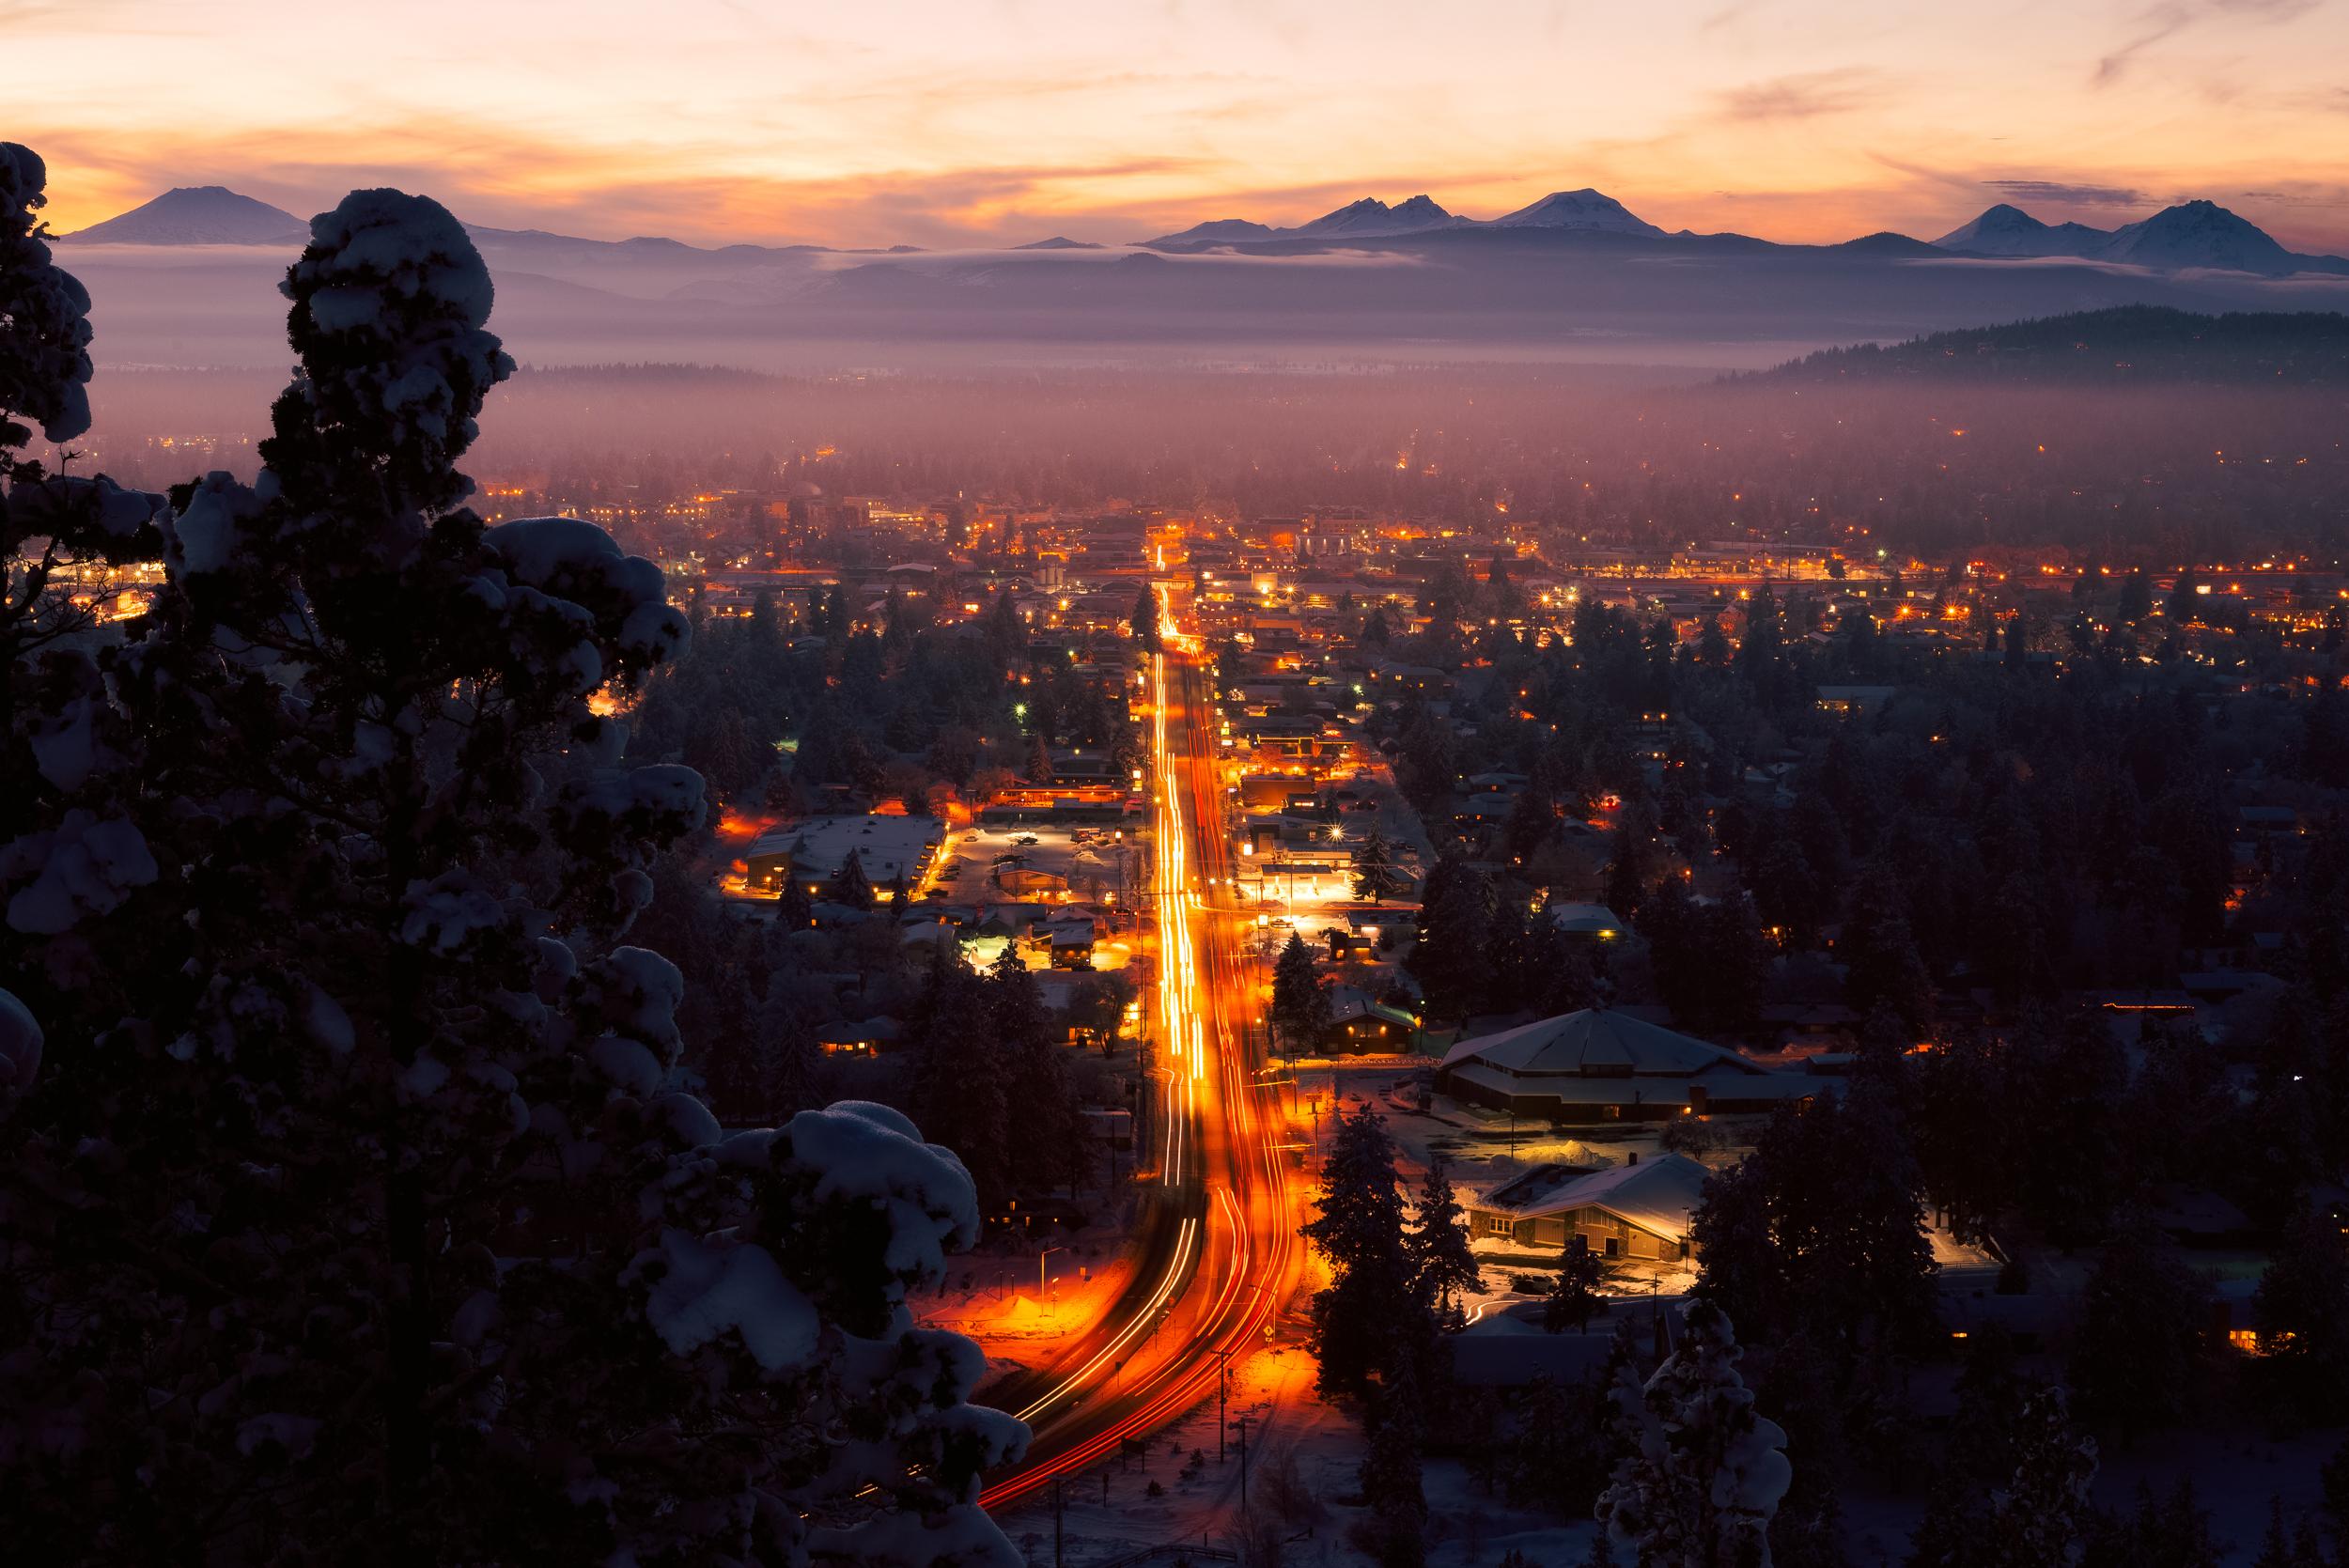 Bend-Oregon-Steve-Aliberti.jpg